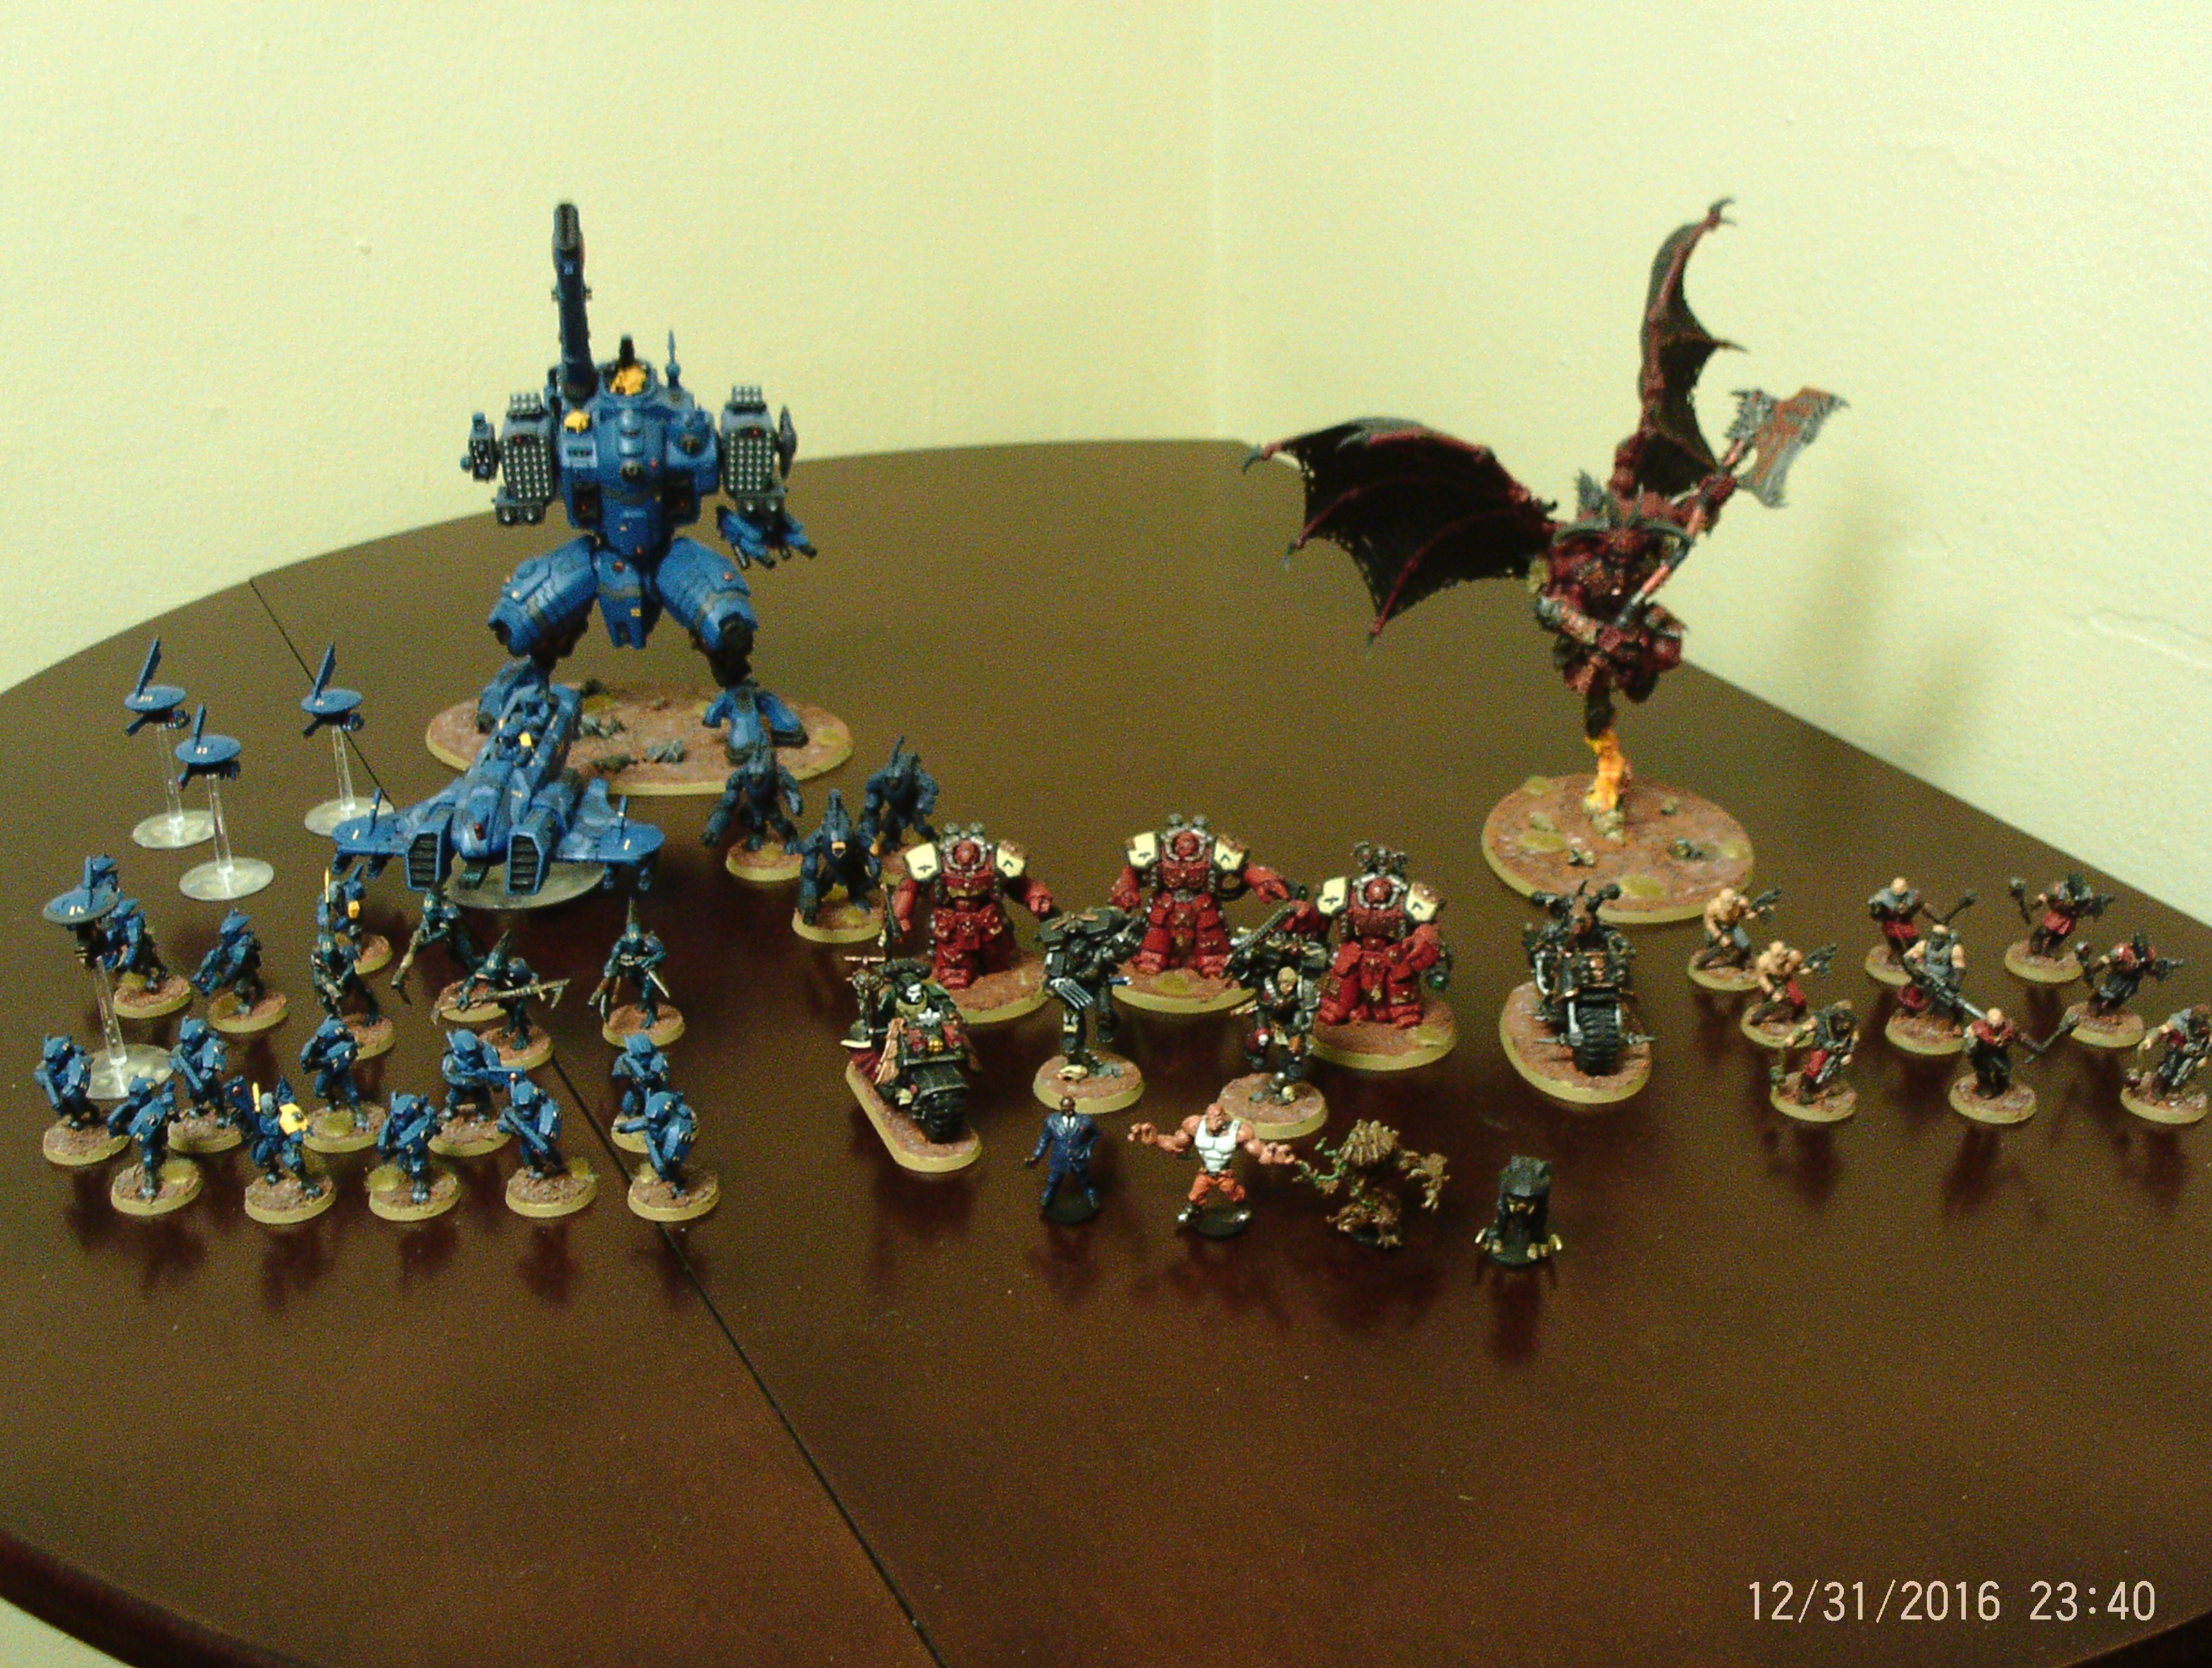 Angel, Battlesuit, Chaos, Collection, Convict, Daemonkin, Daemons, Dark, Deathwatch, Dreadball, Drone, Fire, Khorne, Space, Space Marines, Tau, Warriors